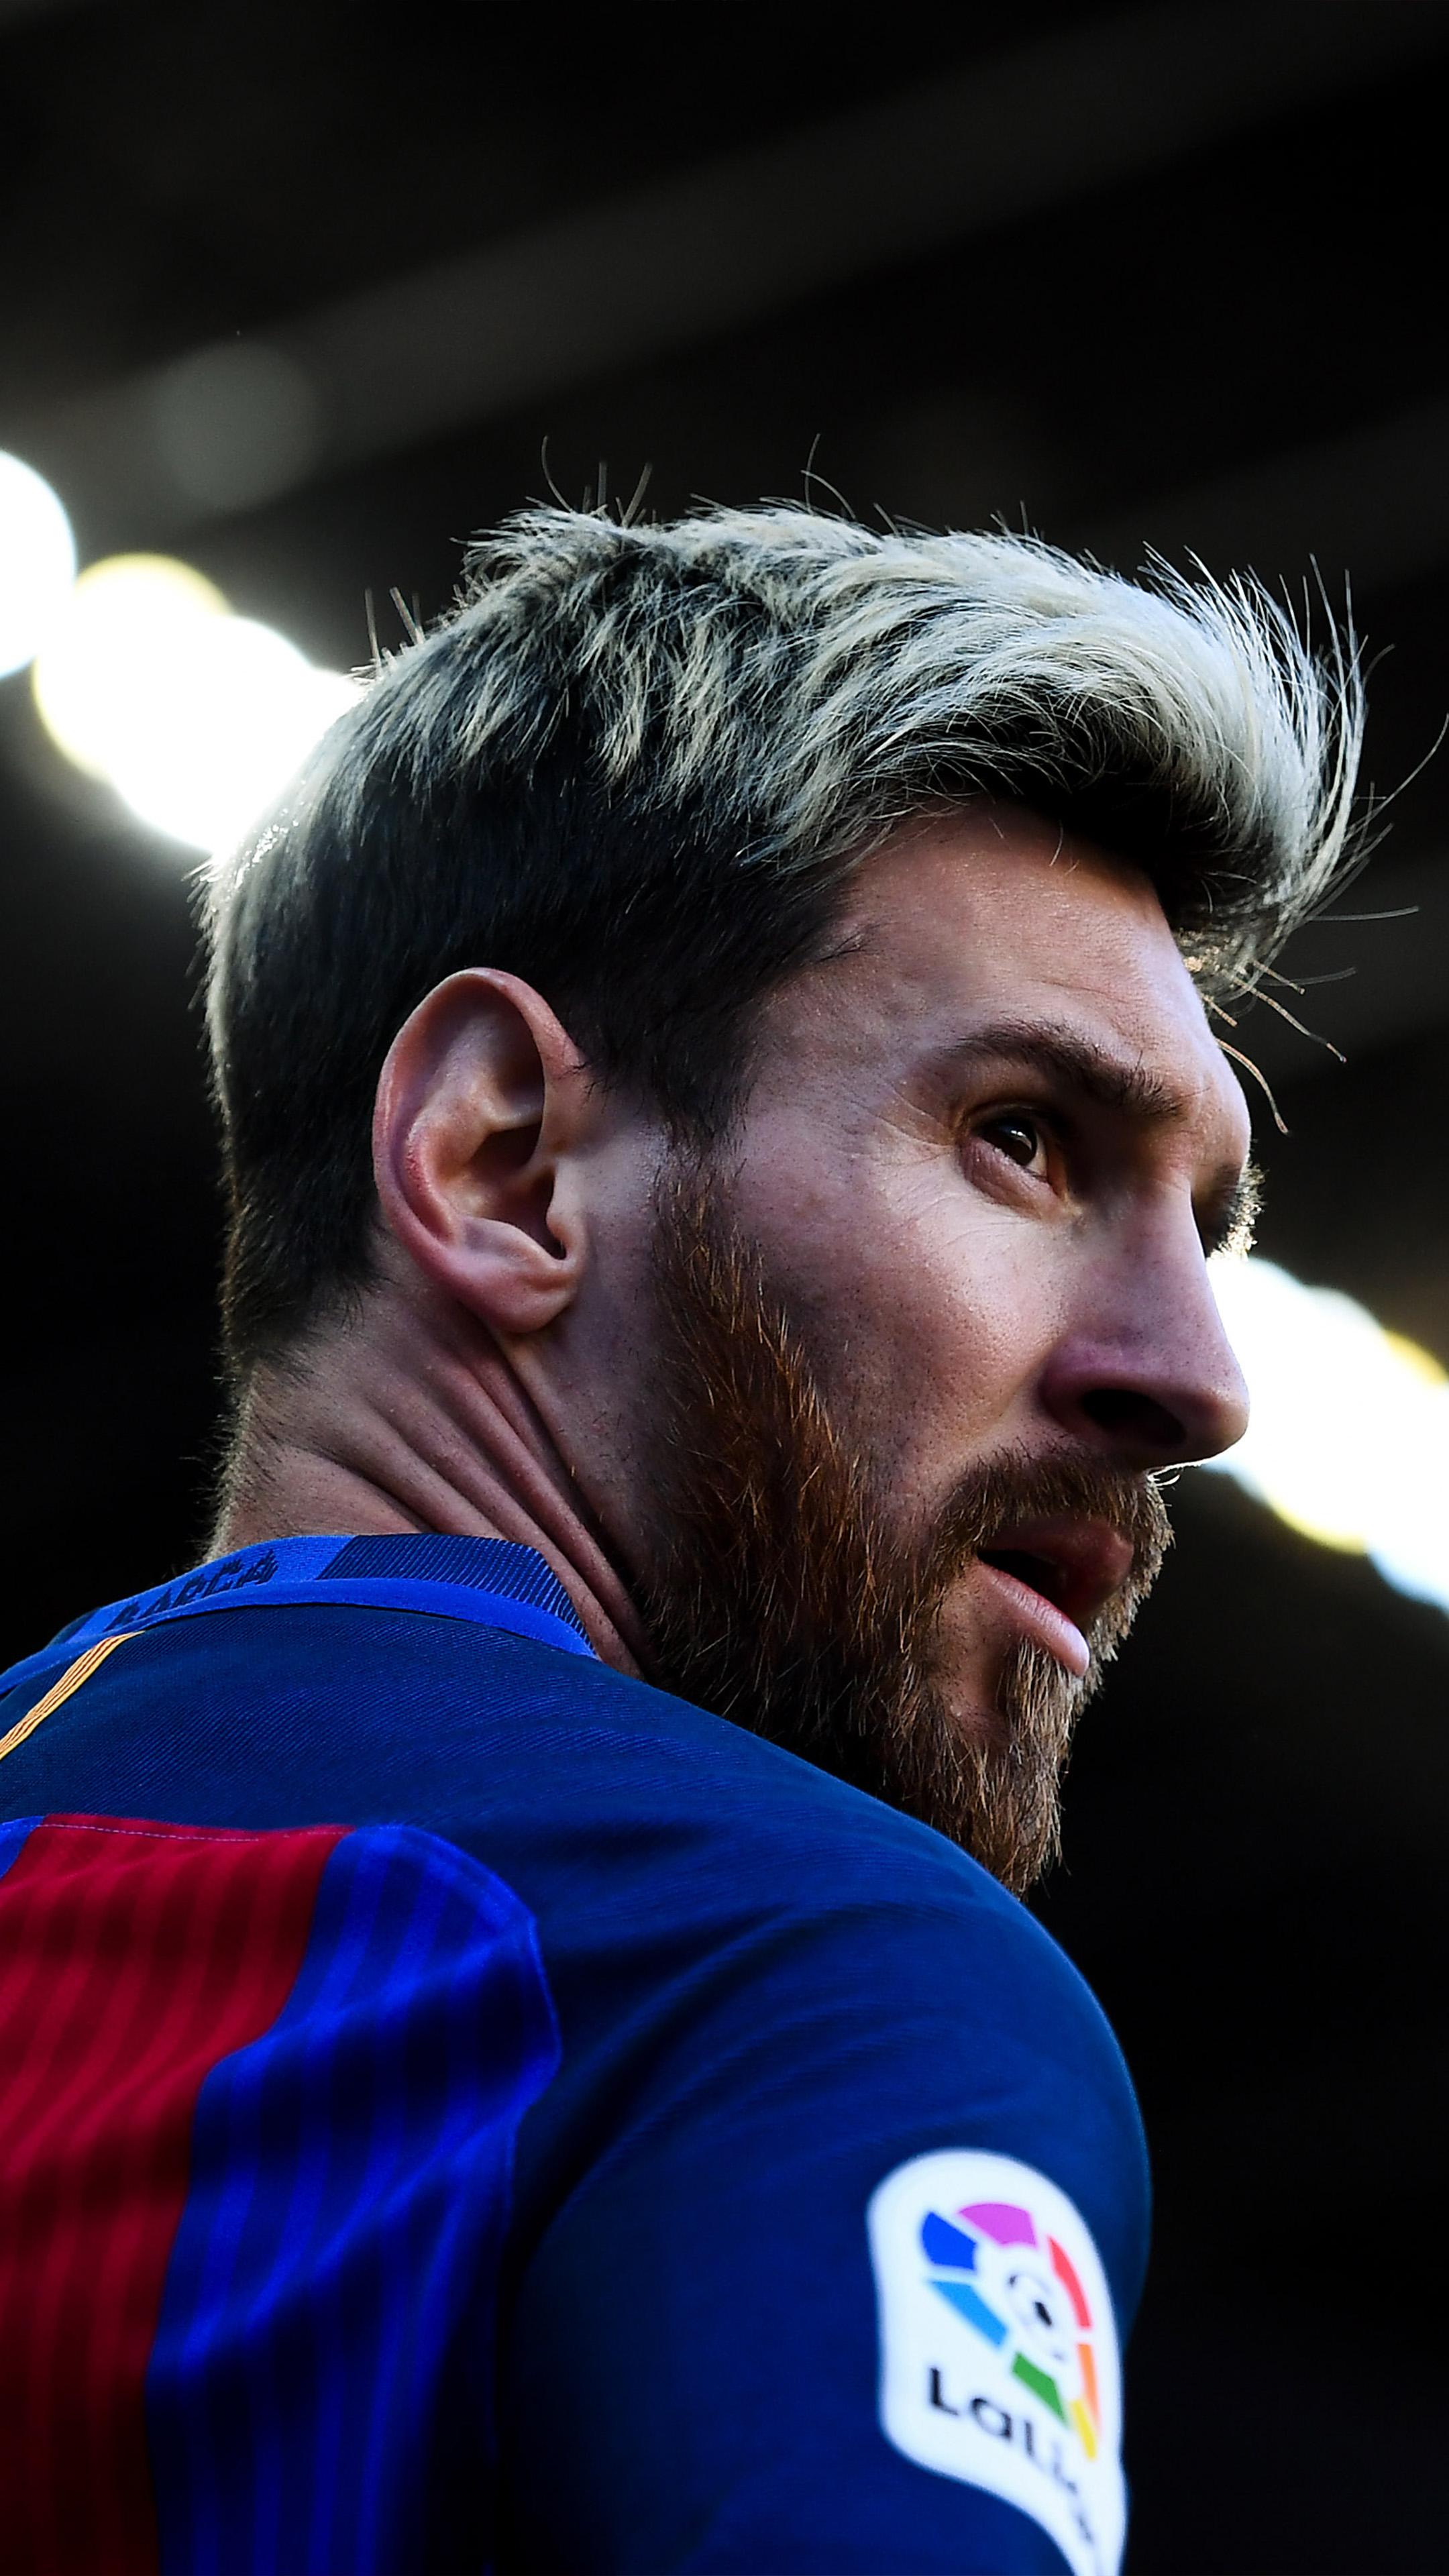 Lionel Messi 2018 4k Ultra Hd Mobile Wallpaper